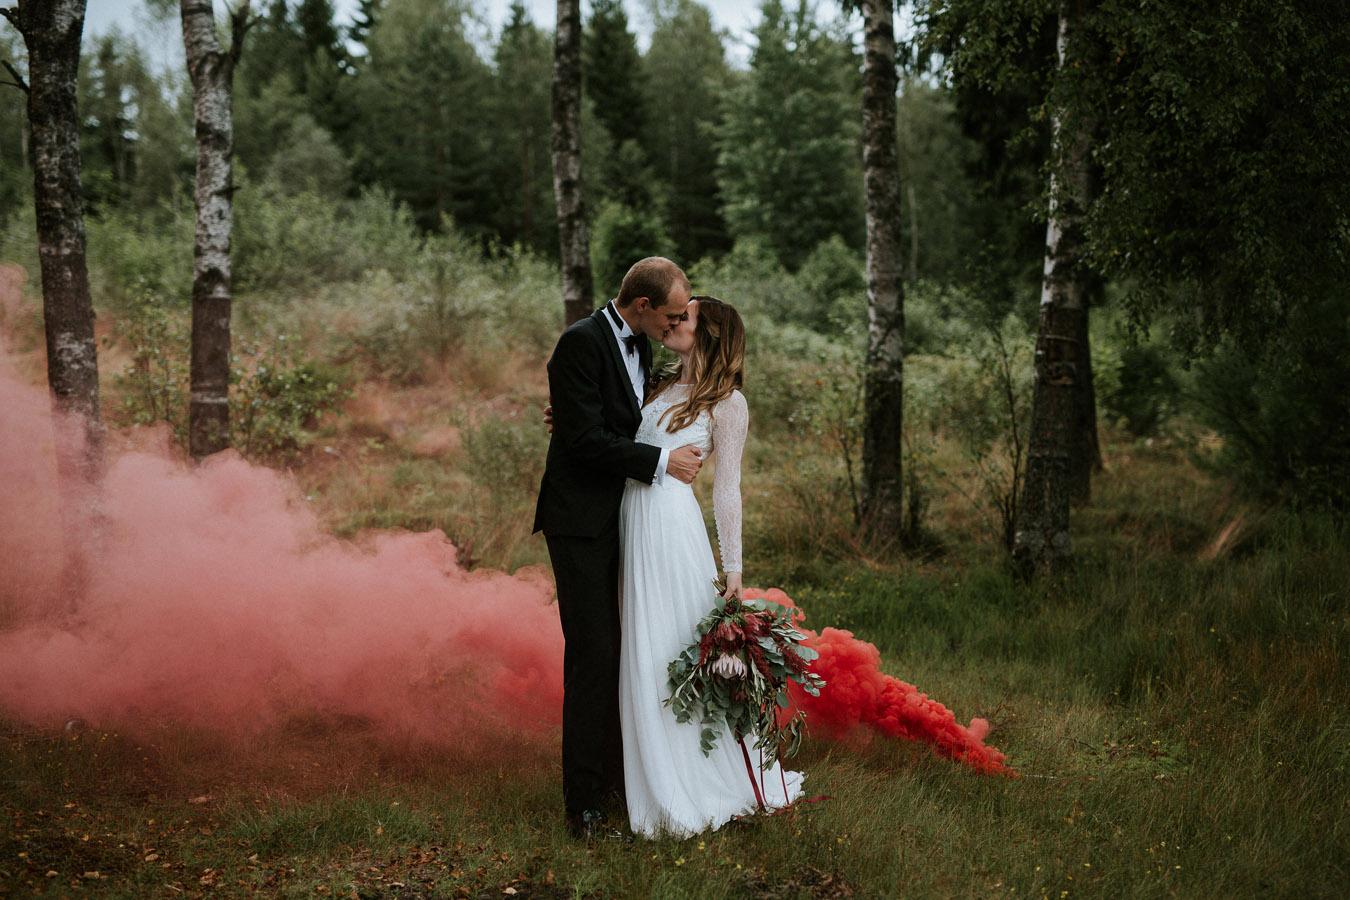 Fotograf-Tone-Tvedt-bryllup-148.jpg